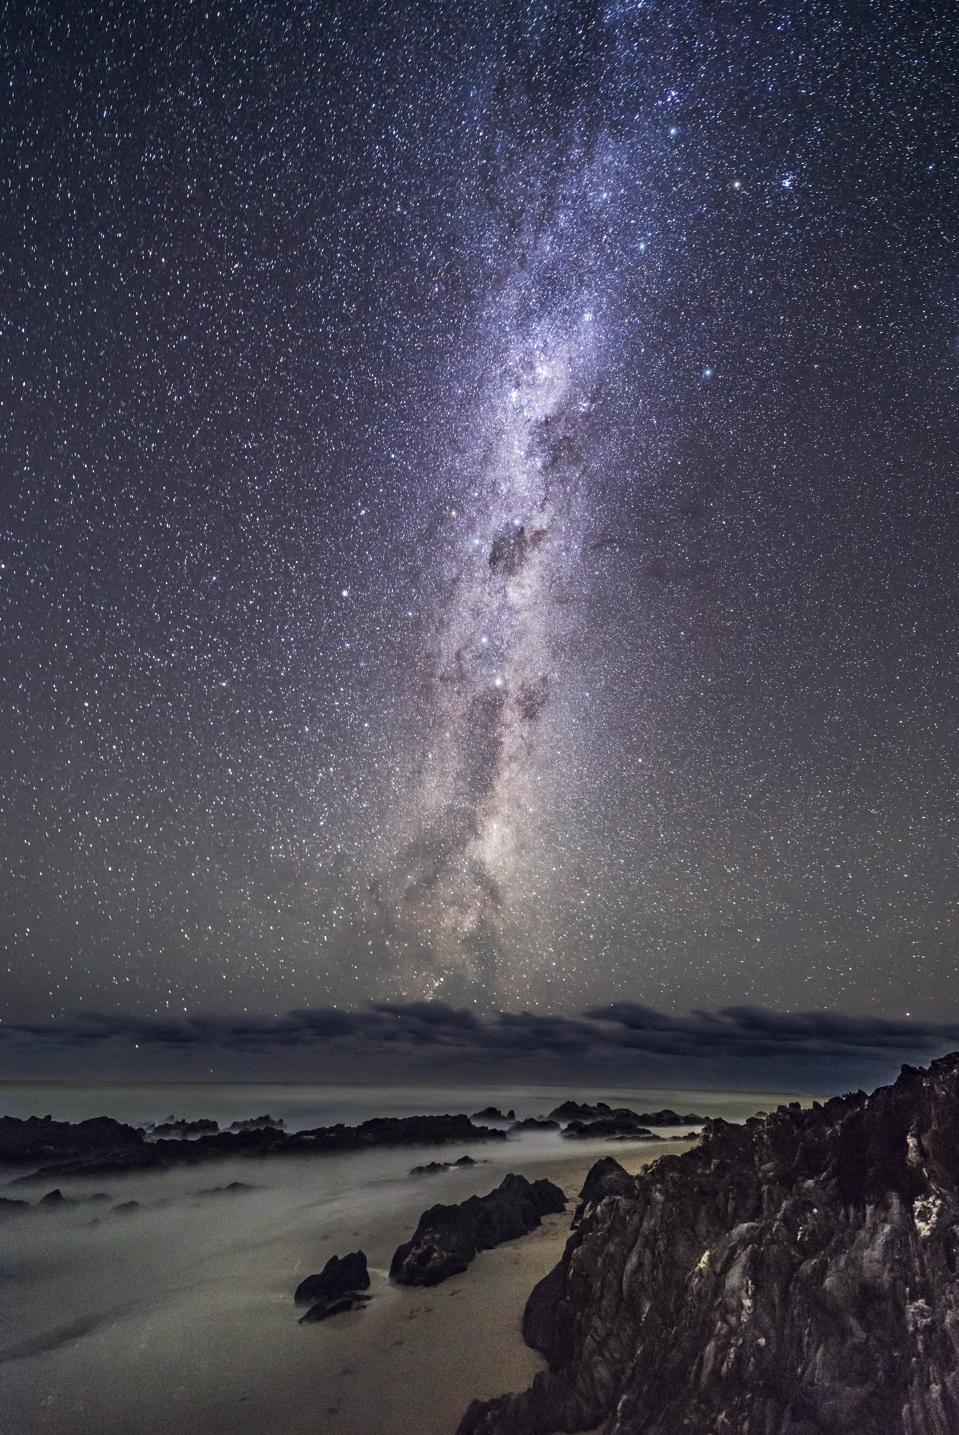 The Dark Emu of aboriginal sky lore rising out of the Tasman Sea.